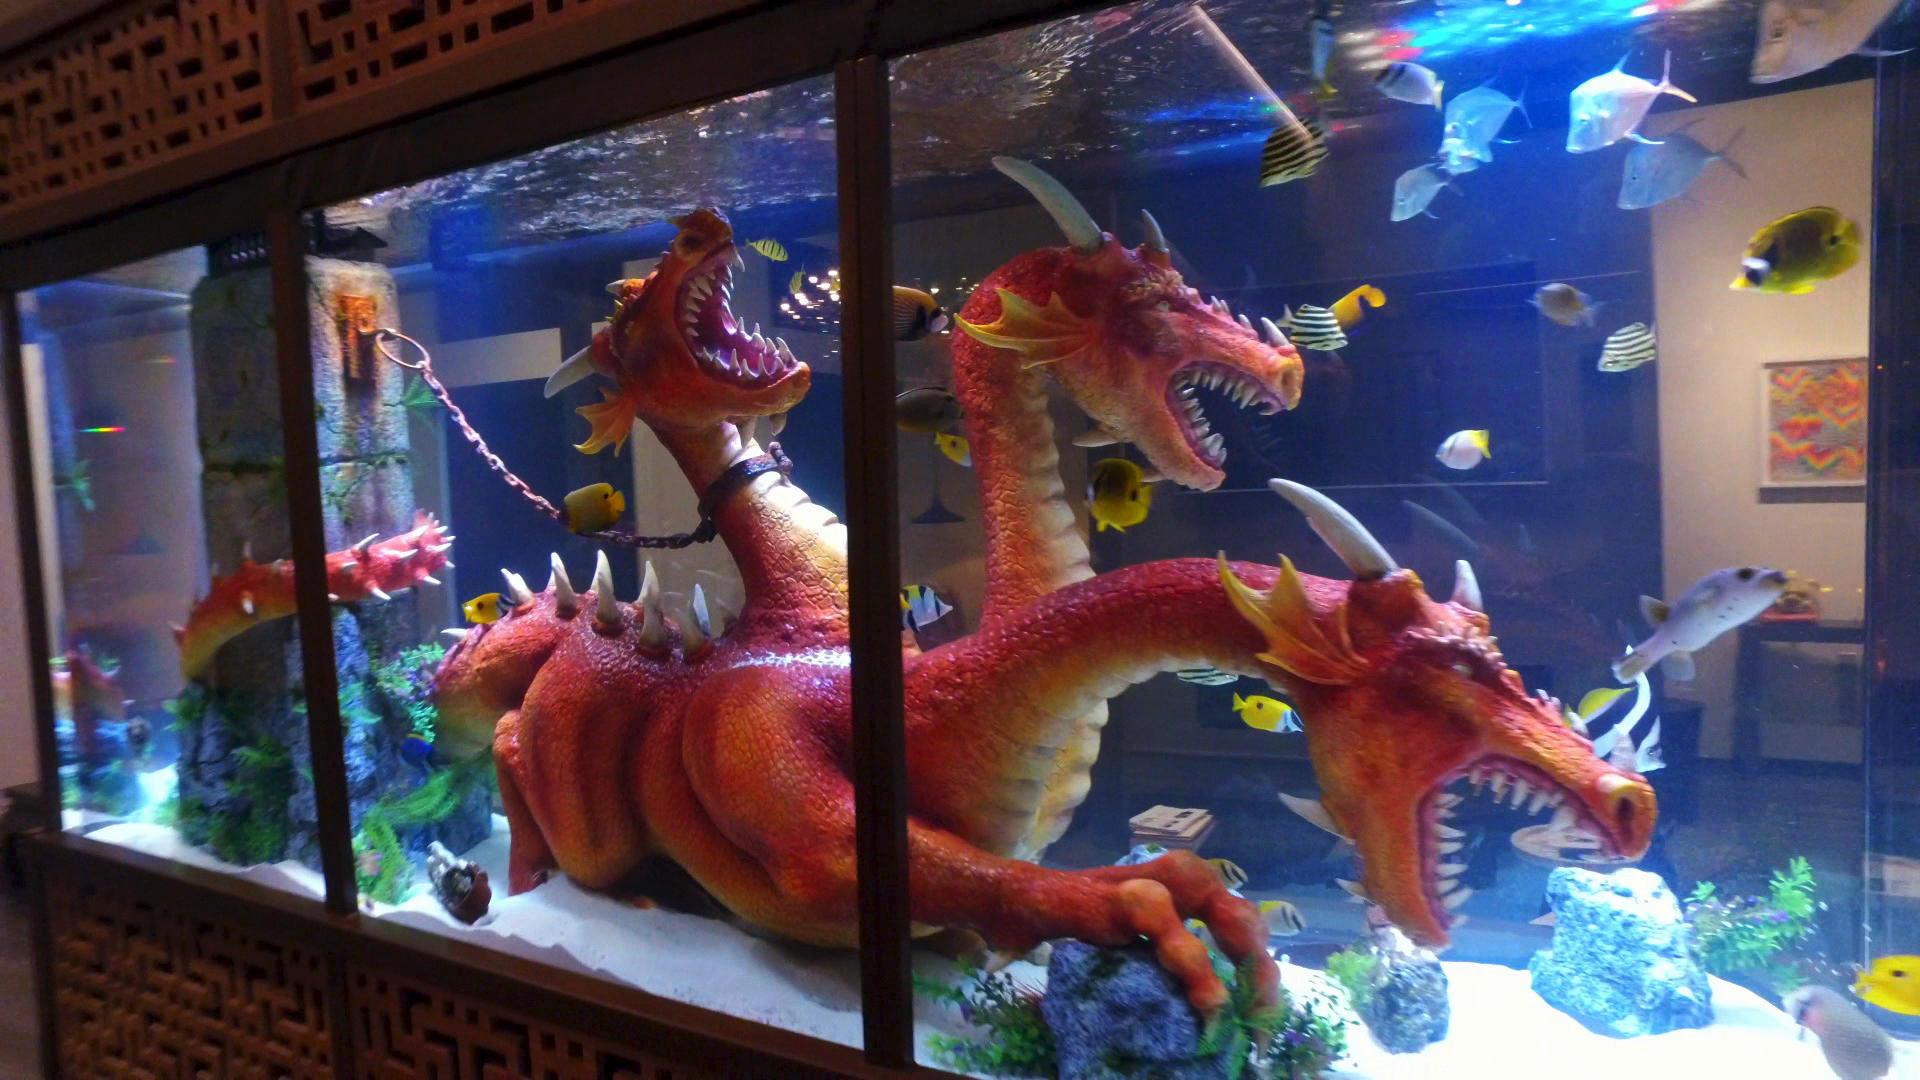 Zombie fish tank youtube - Zombie Fish Tank Youtube